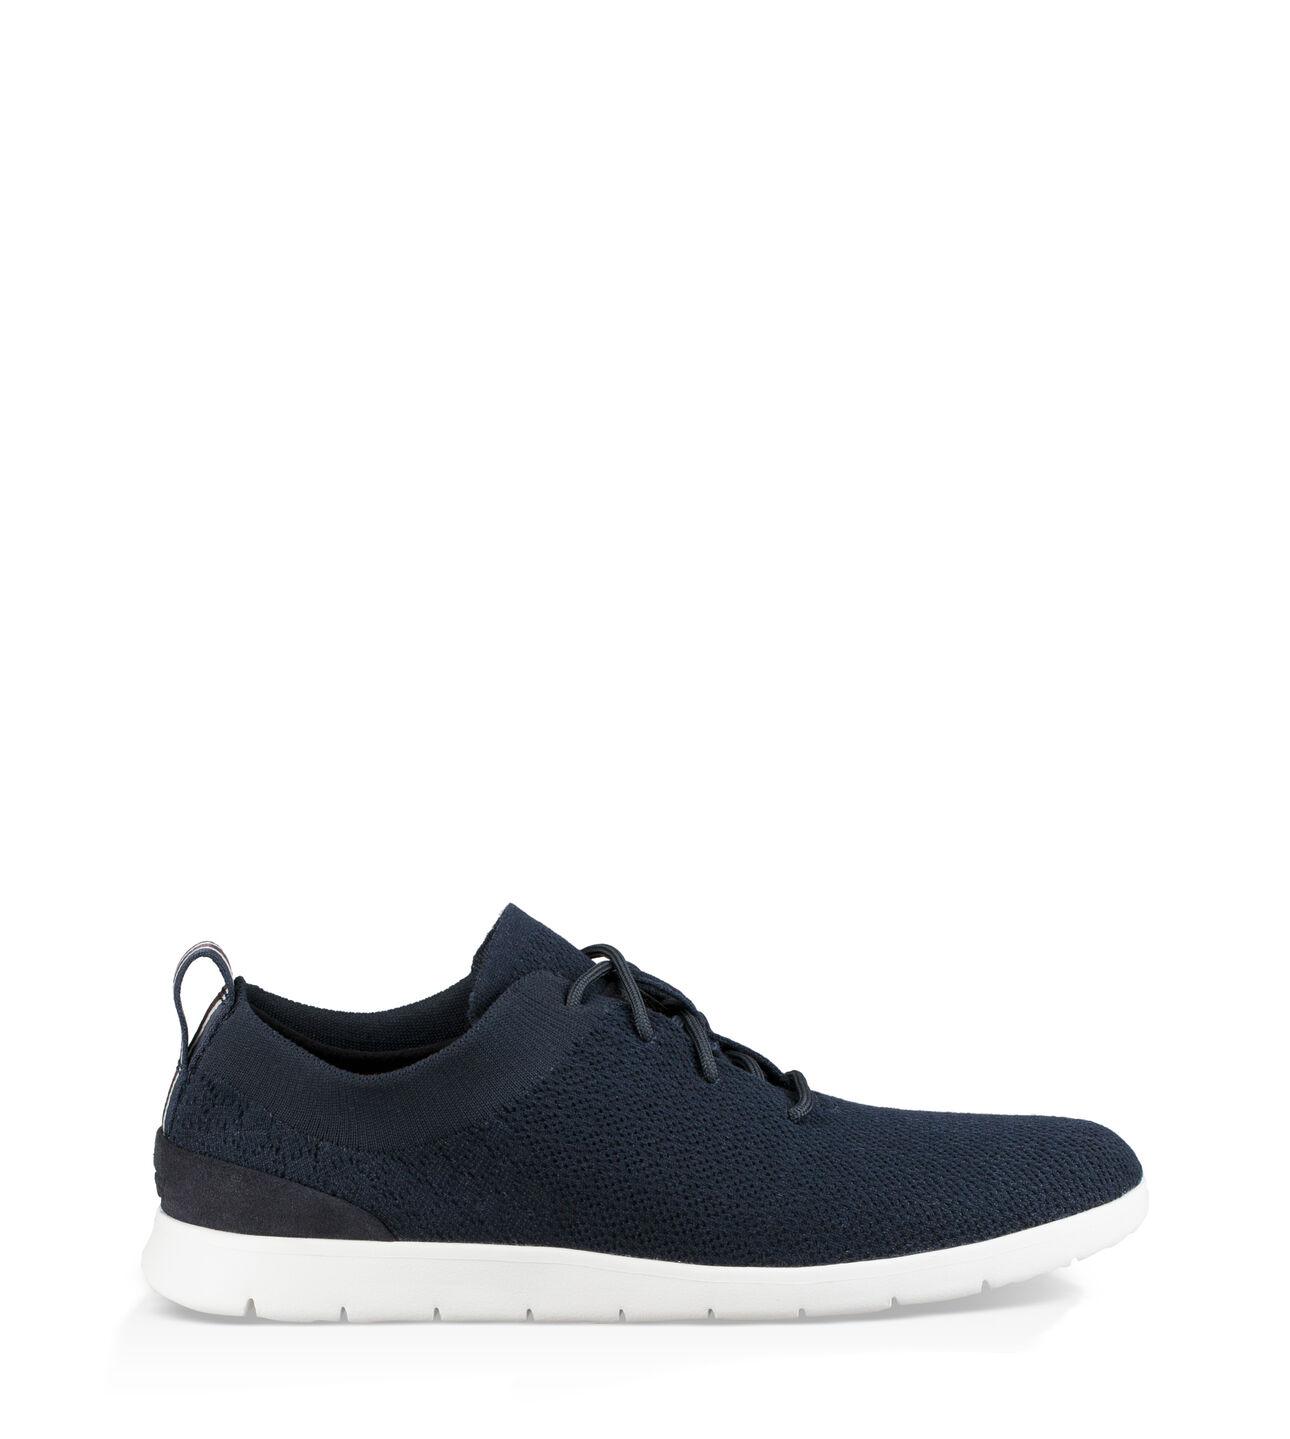 9114afd5b91 Feli HyperWeave Sneaker